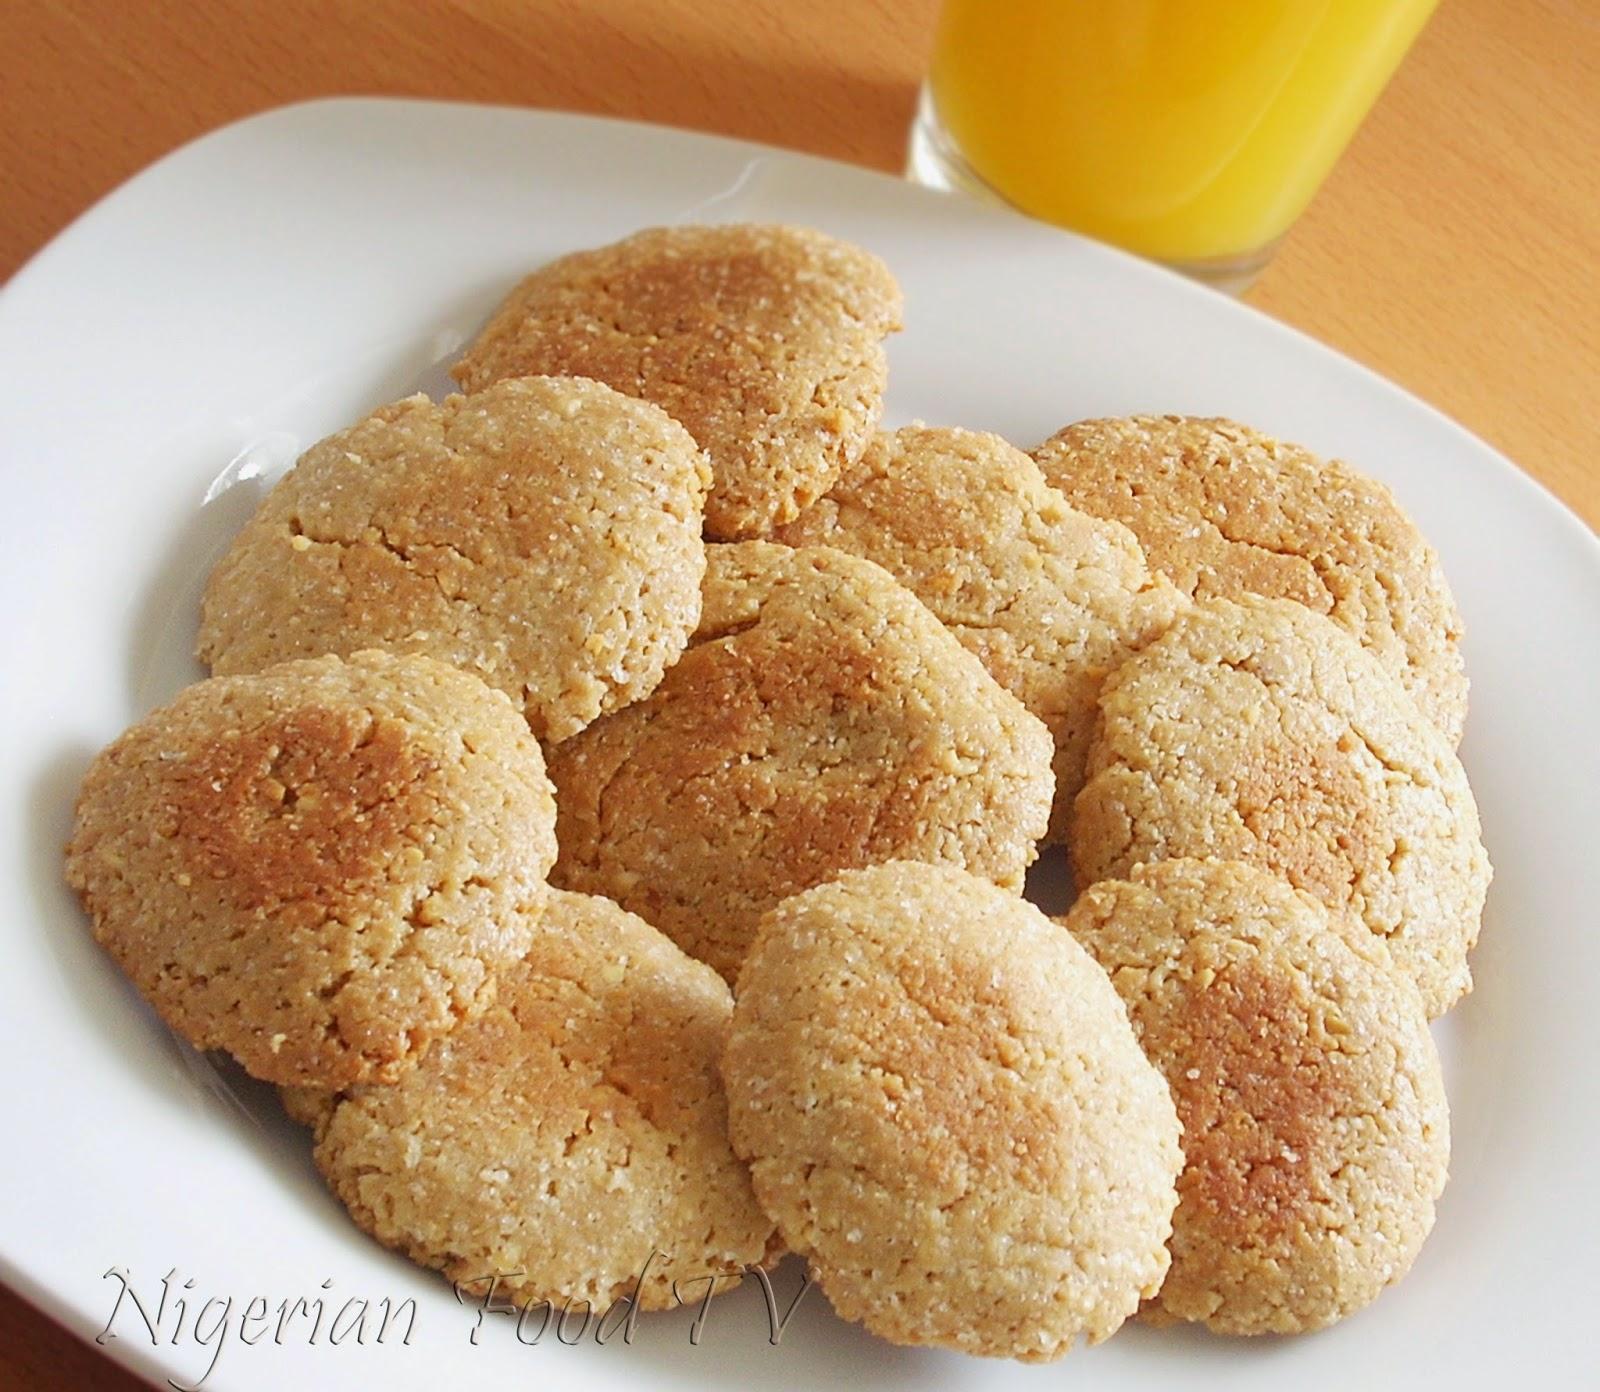 Homemade Peanut Cookies, nigerian food tv, groundut biscuits